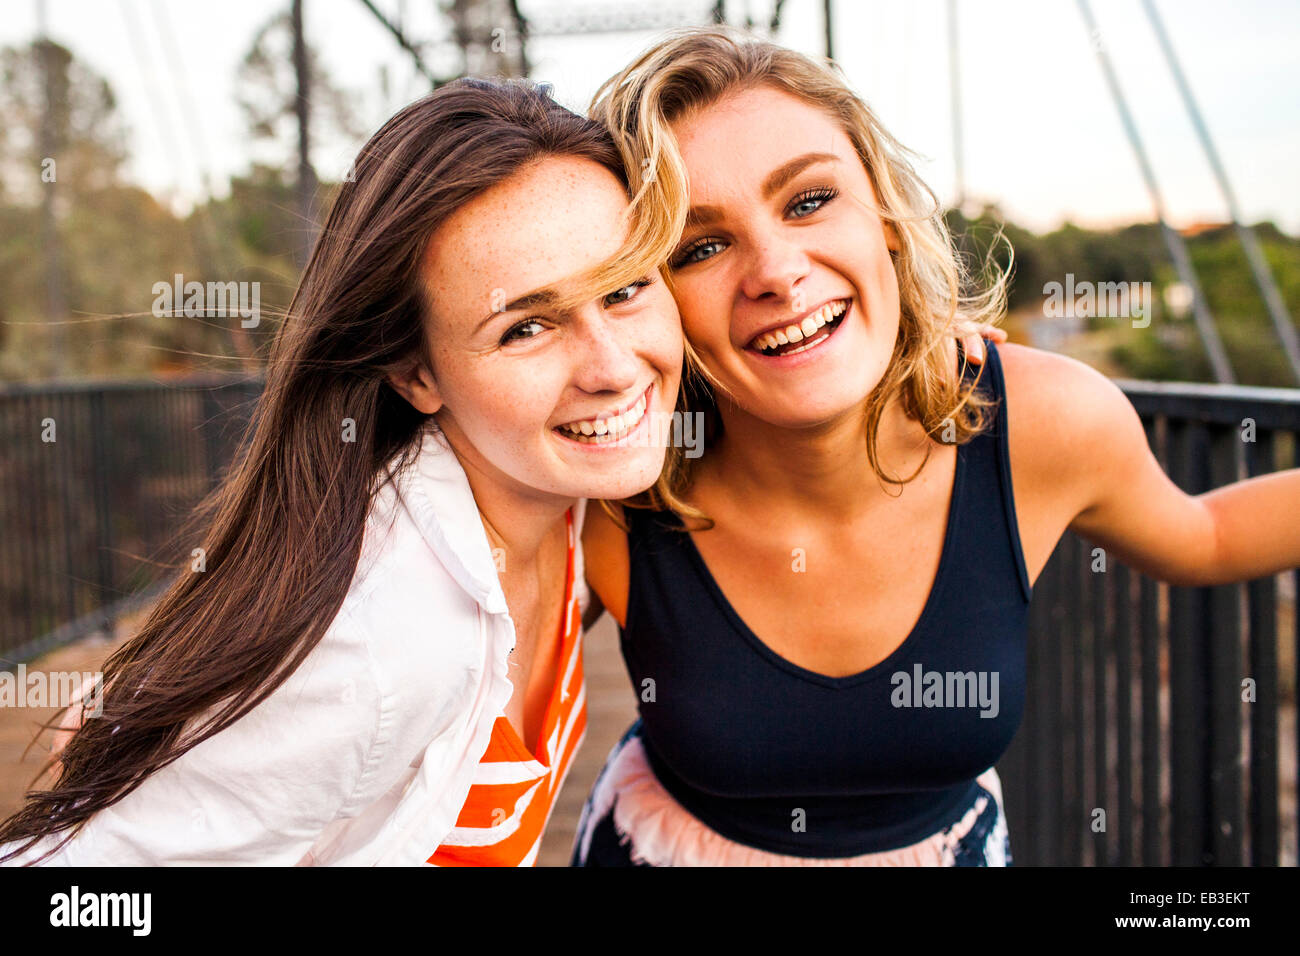 Girls geile teenager Alexis Bledel